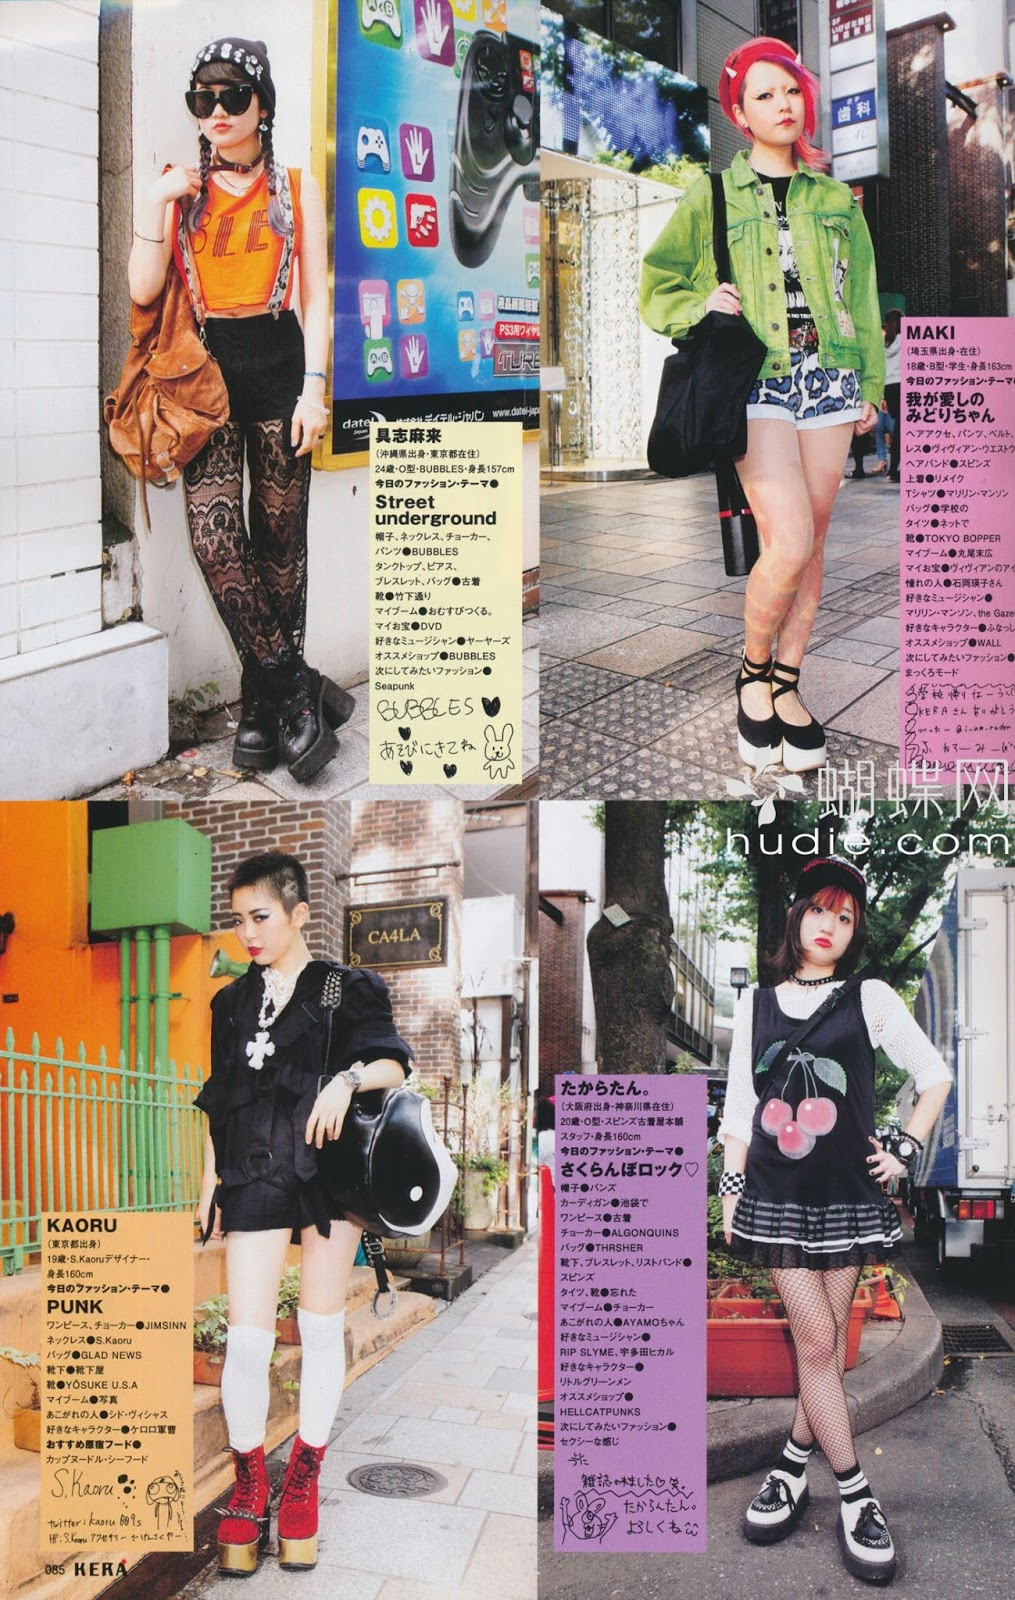 Kera Magazine September 2013 Issue